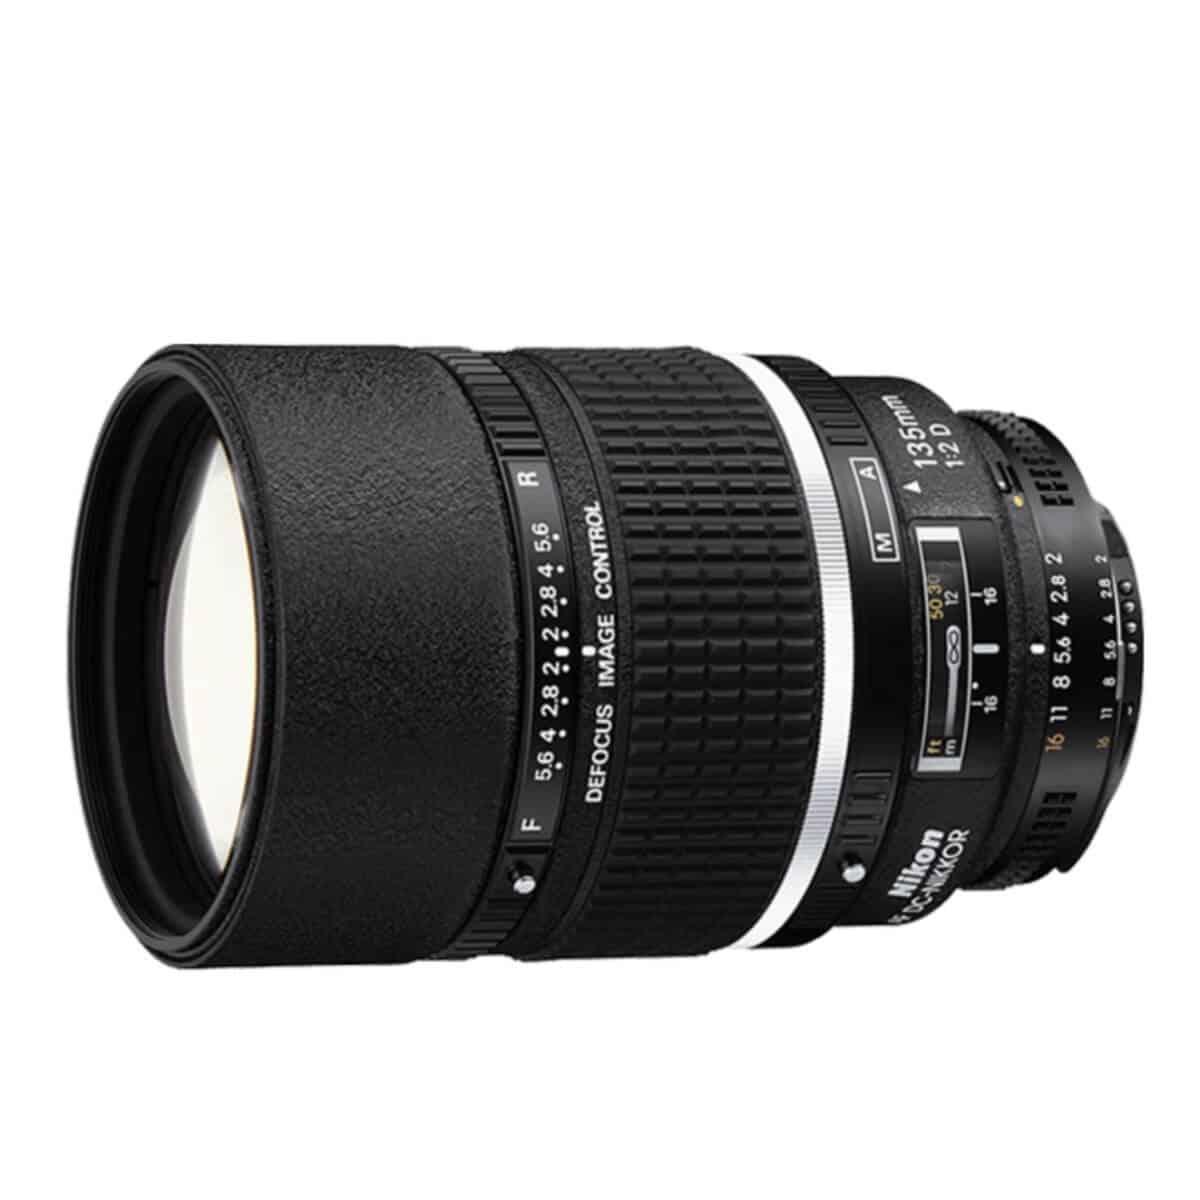 Nikon 135mm lens.